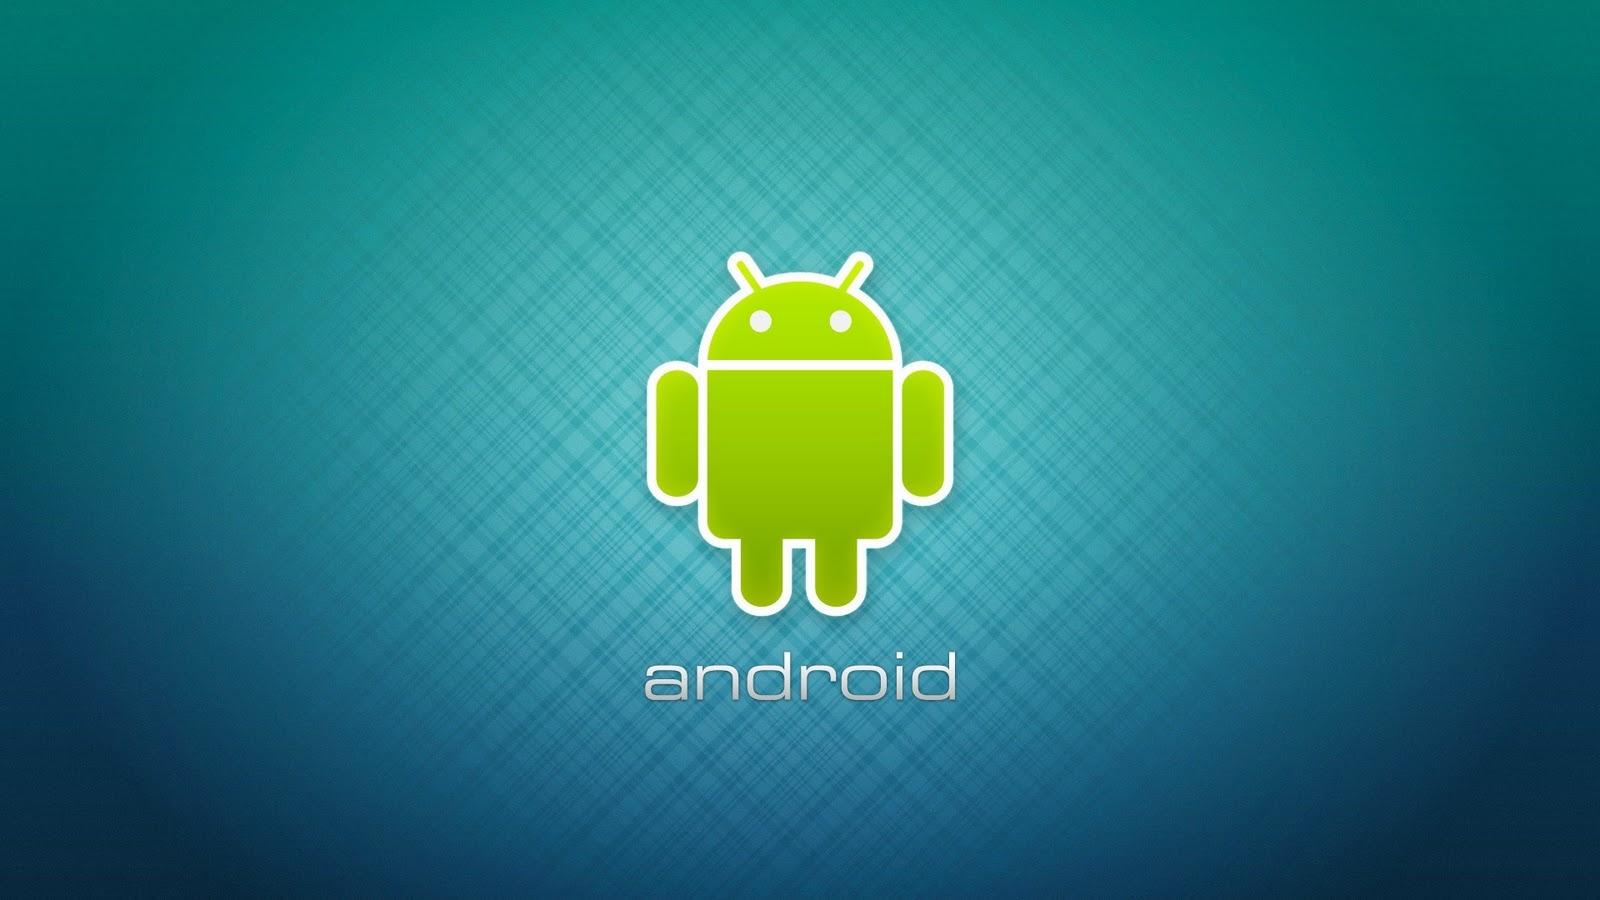 http://2.bp.blogspot.com/--UKehM9kB8s/ToiVX4MoXmI/AAAAAAAAACo/V34hFkKacN0/s1600/just_android_logo_wallpaper_3769_hd-1920x1080.jpg